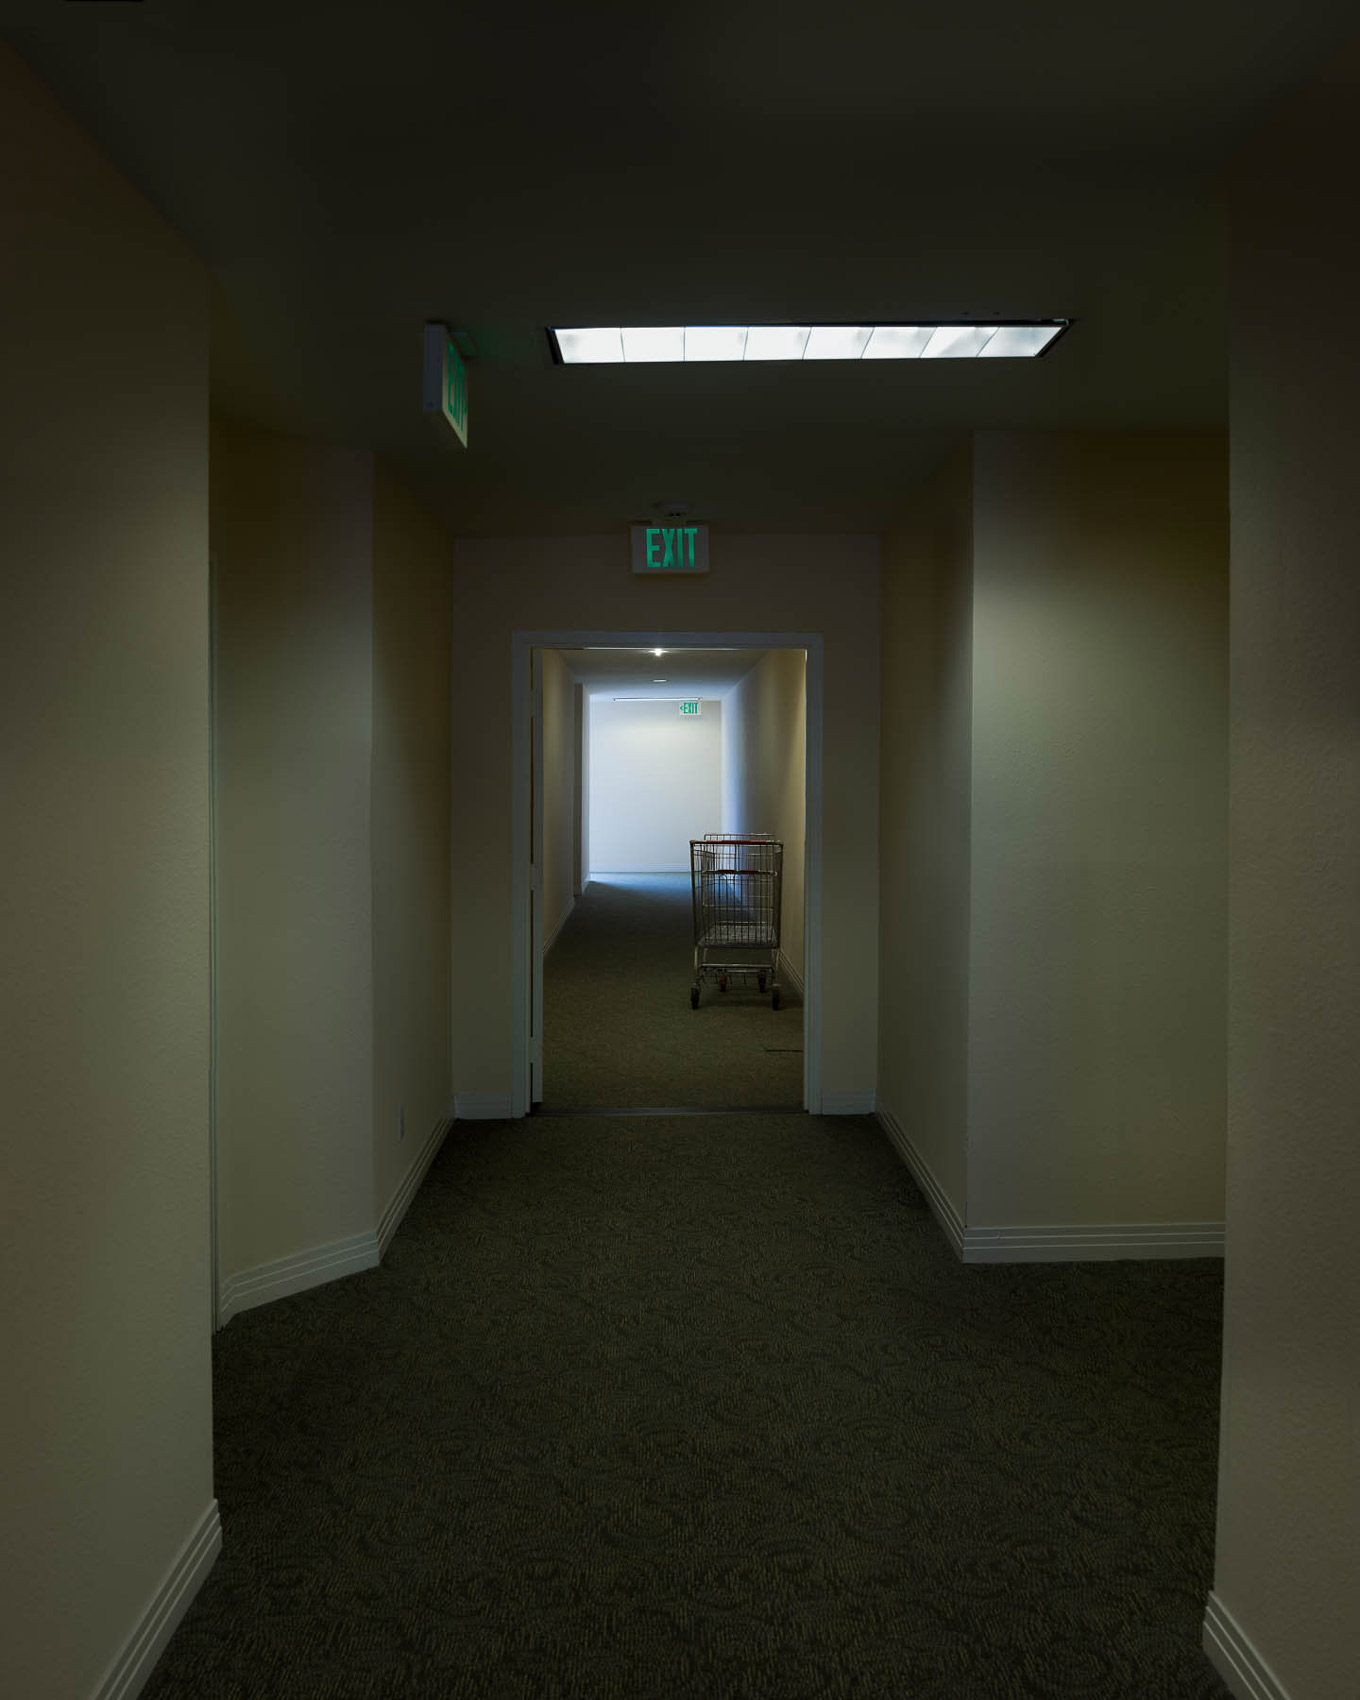 02_david_picchiottino_room_hotel_01_2014-1-10.jpg